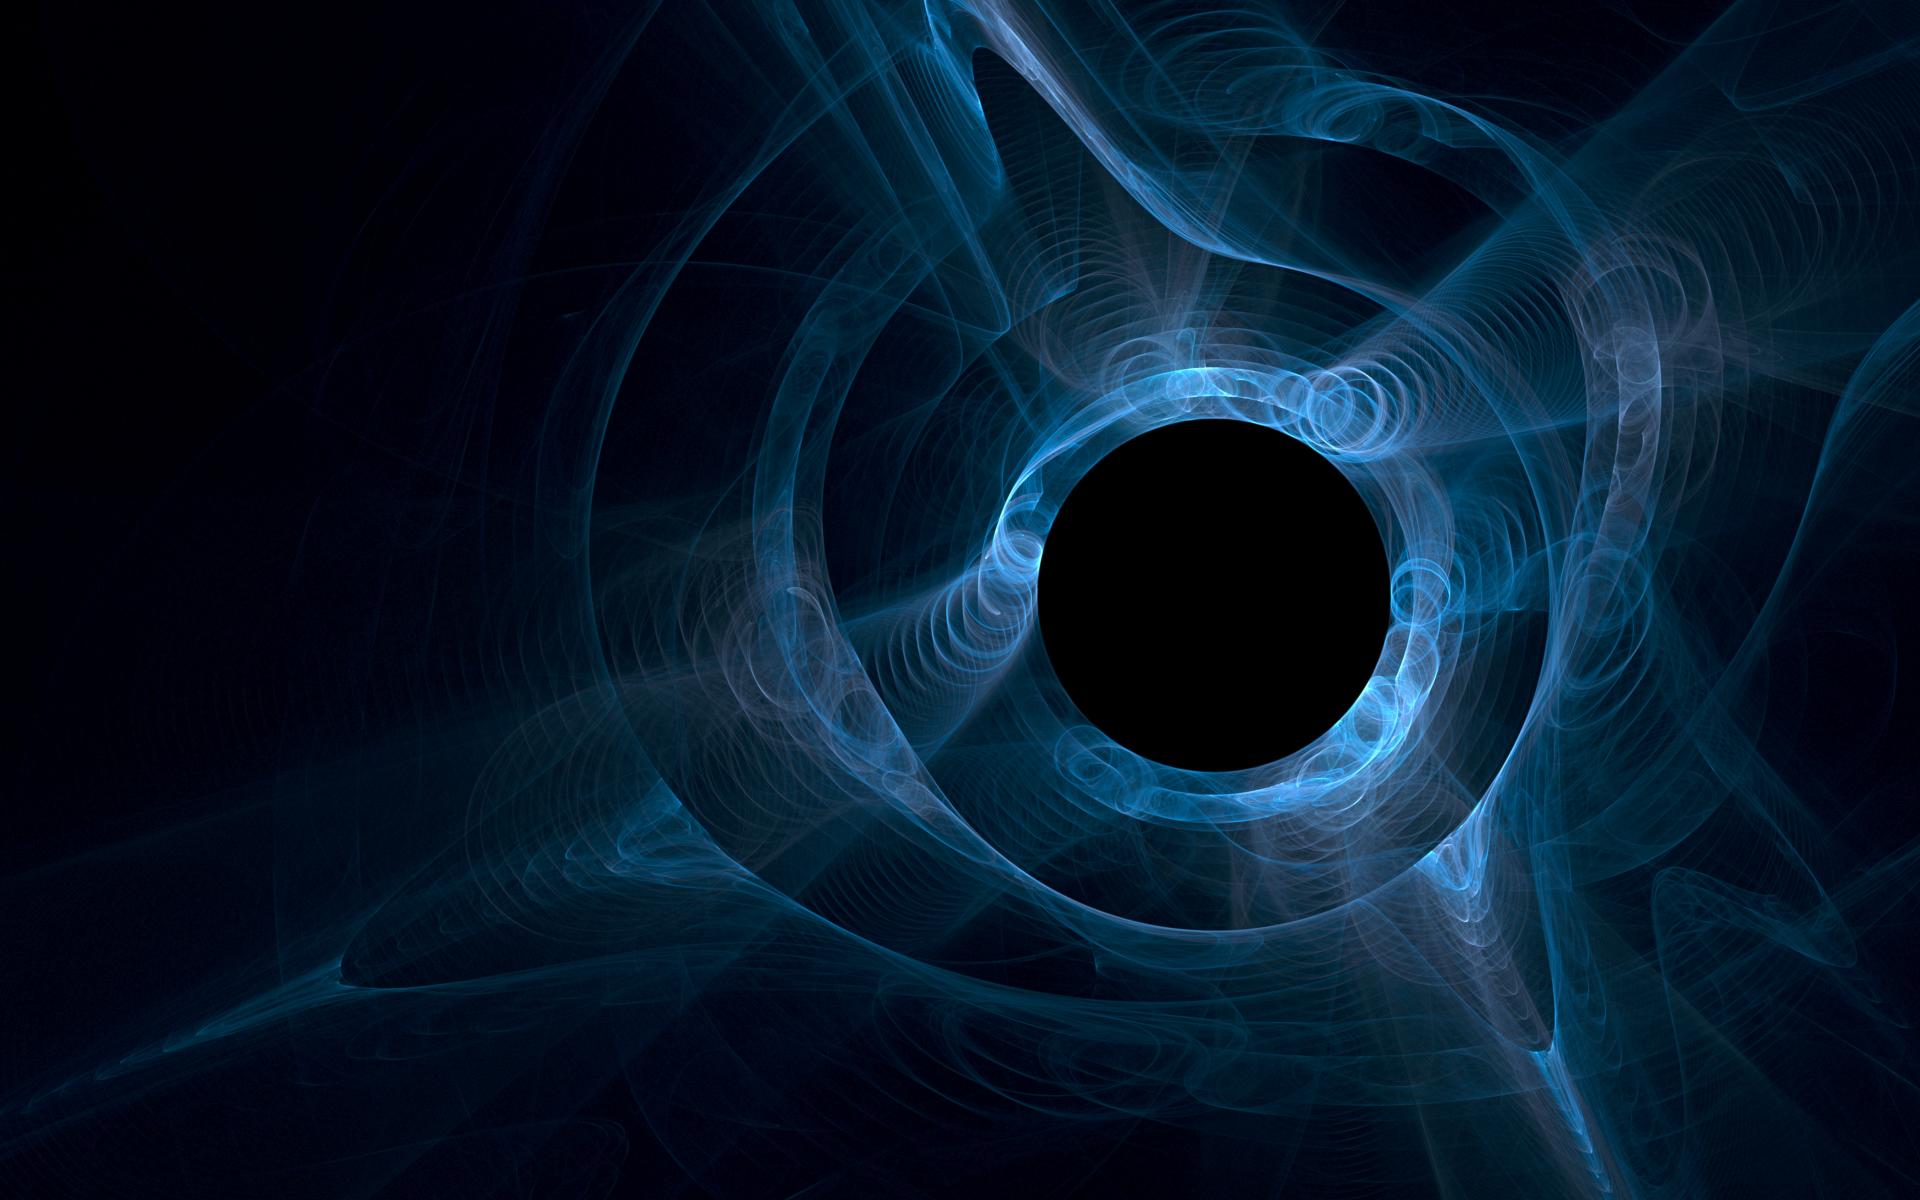 [75+] Blackhole Wallpaper on WallpaperSafari